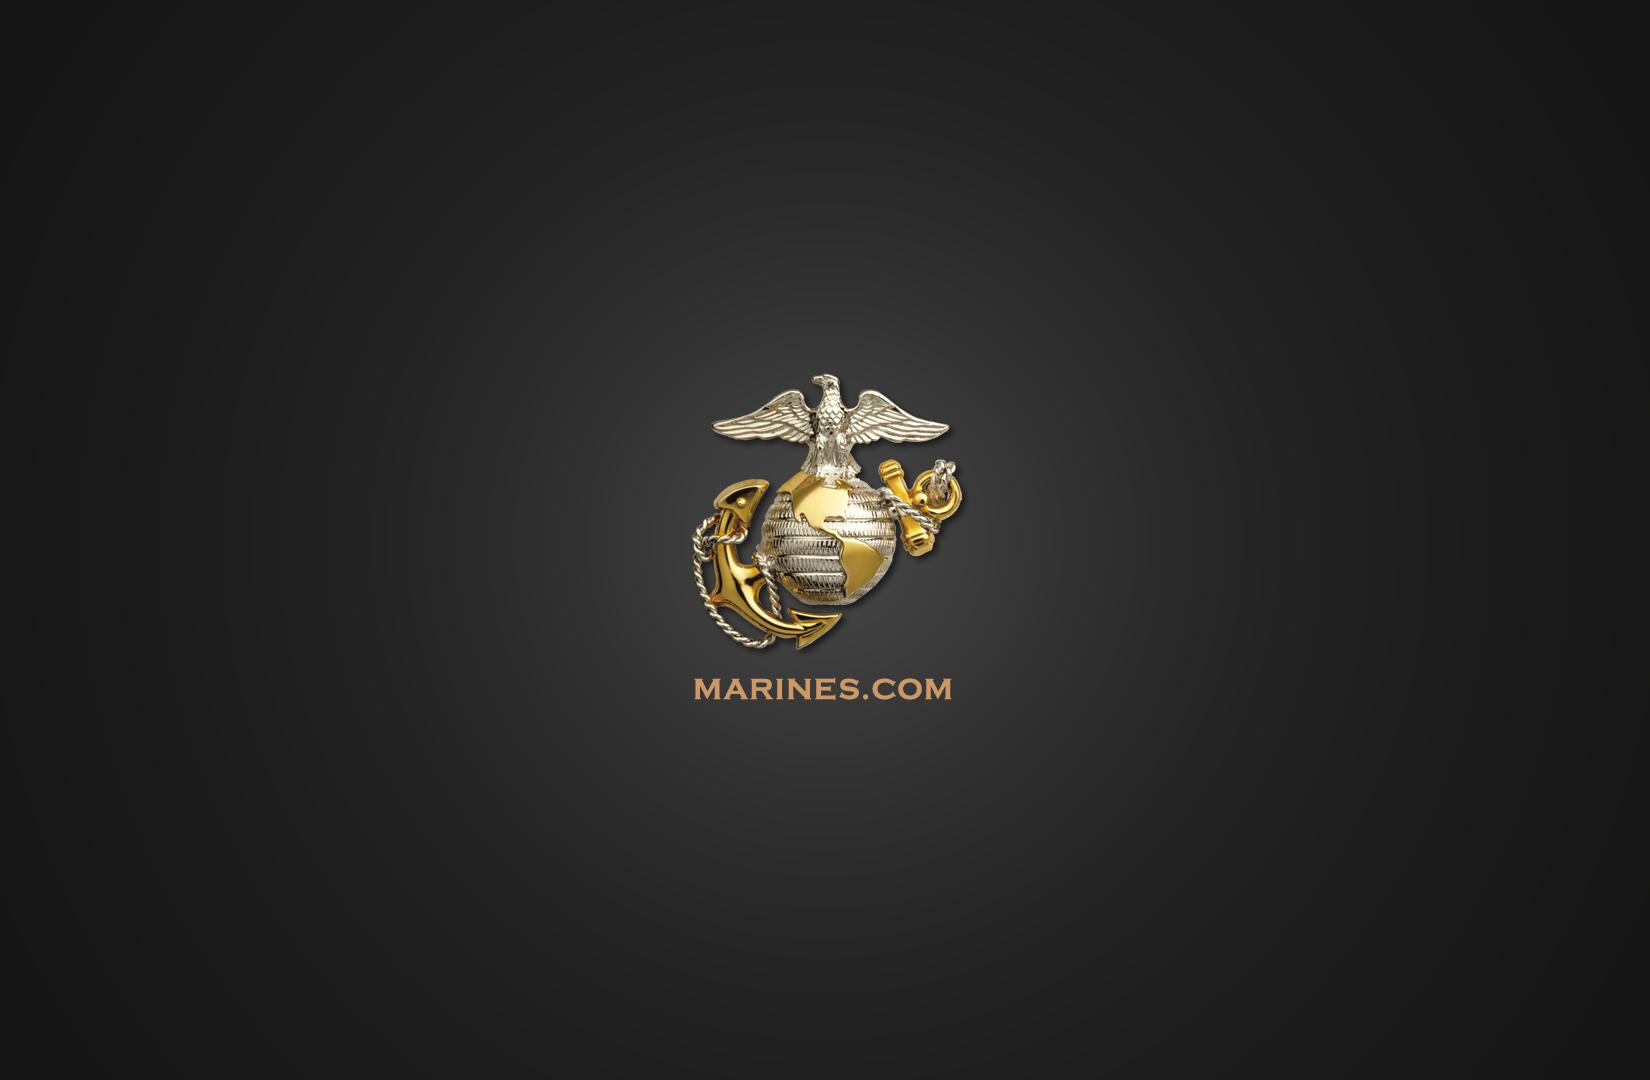 free marine corps wallpaper downloads   weddingdressincom 1650x1080